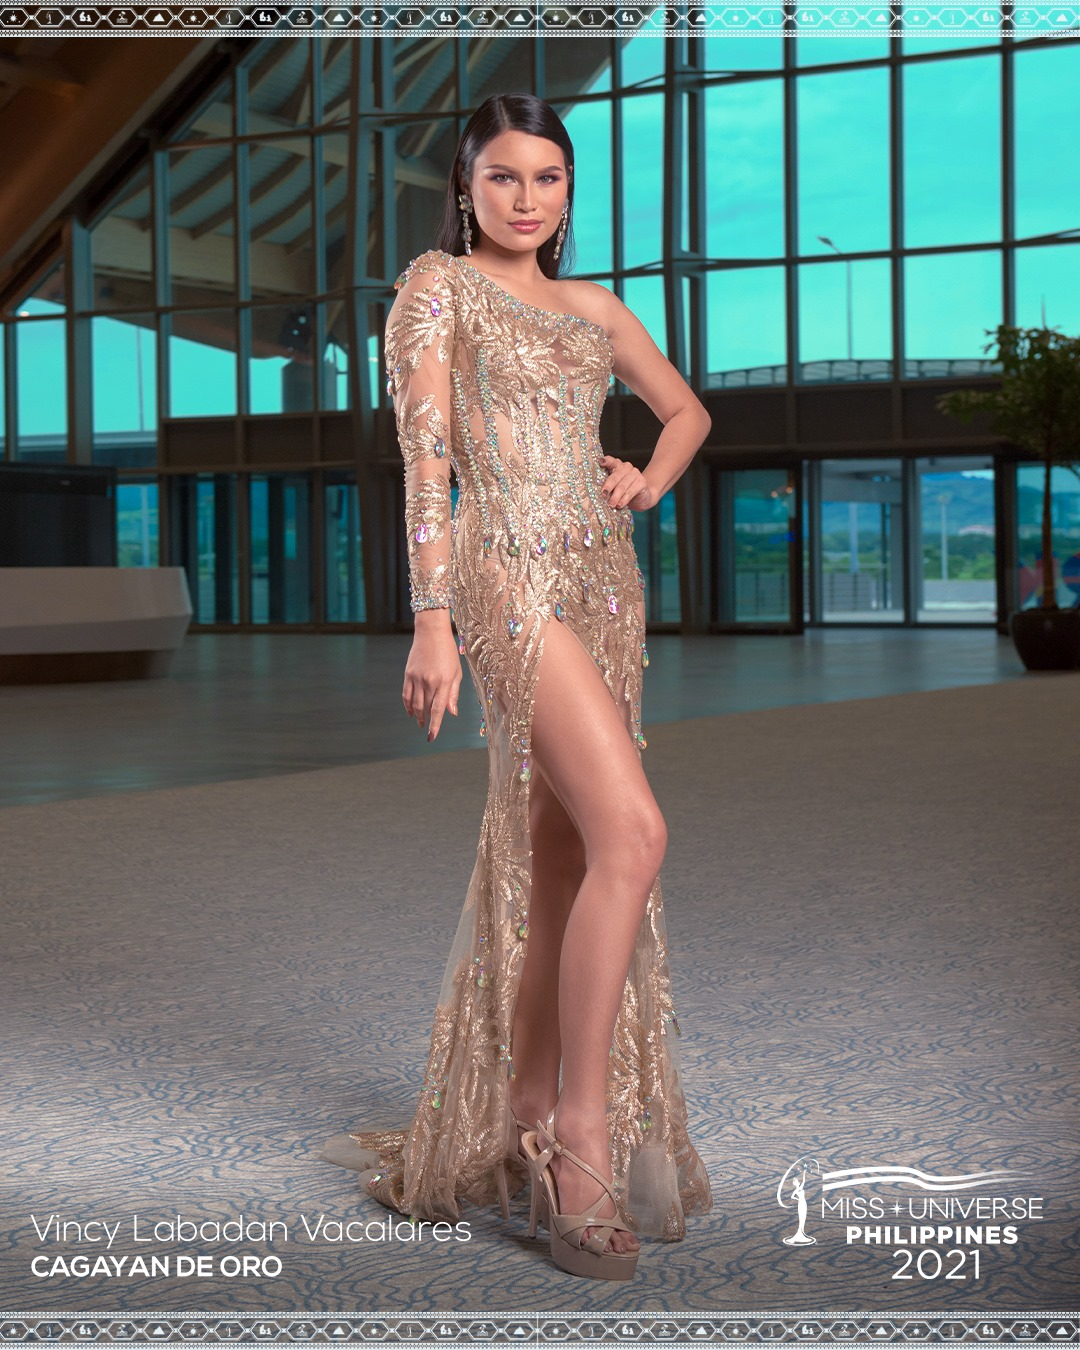 vincy-labadan-vacalares-miss-universe-2021-evening-gown